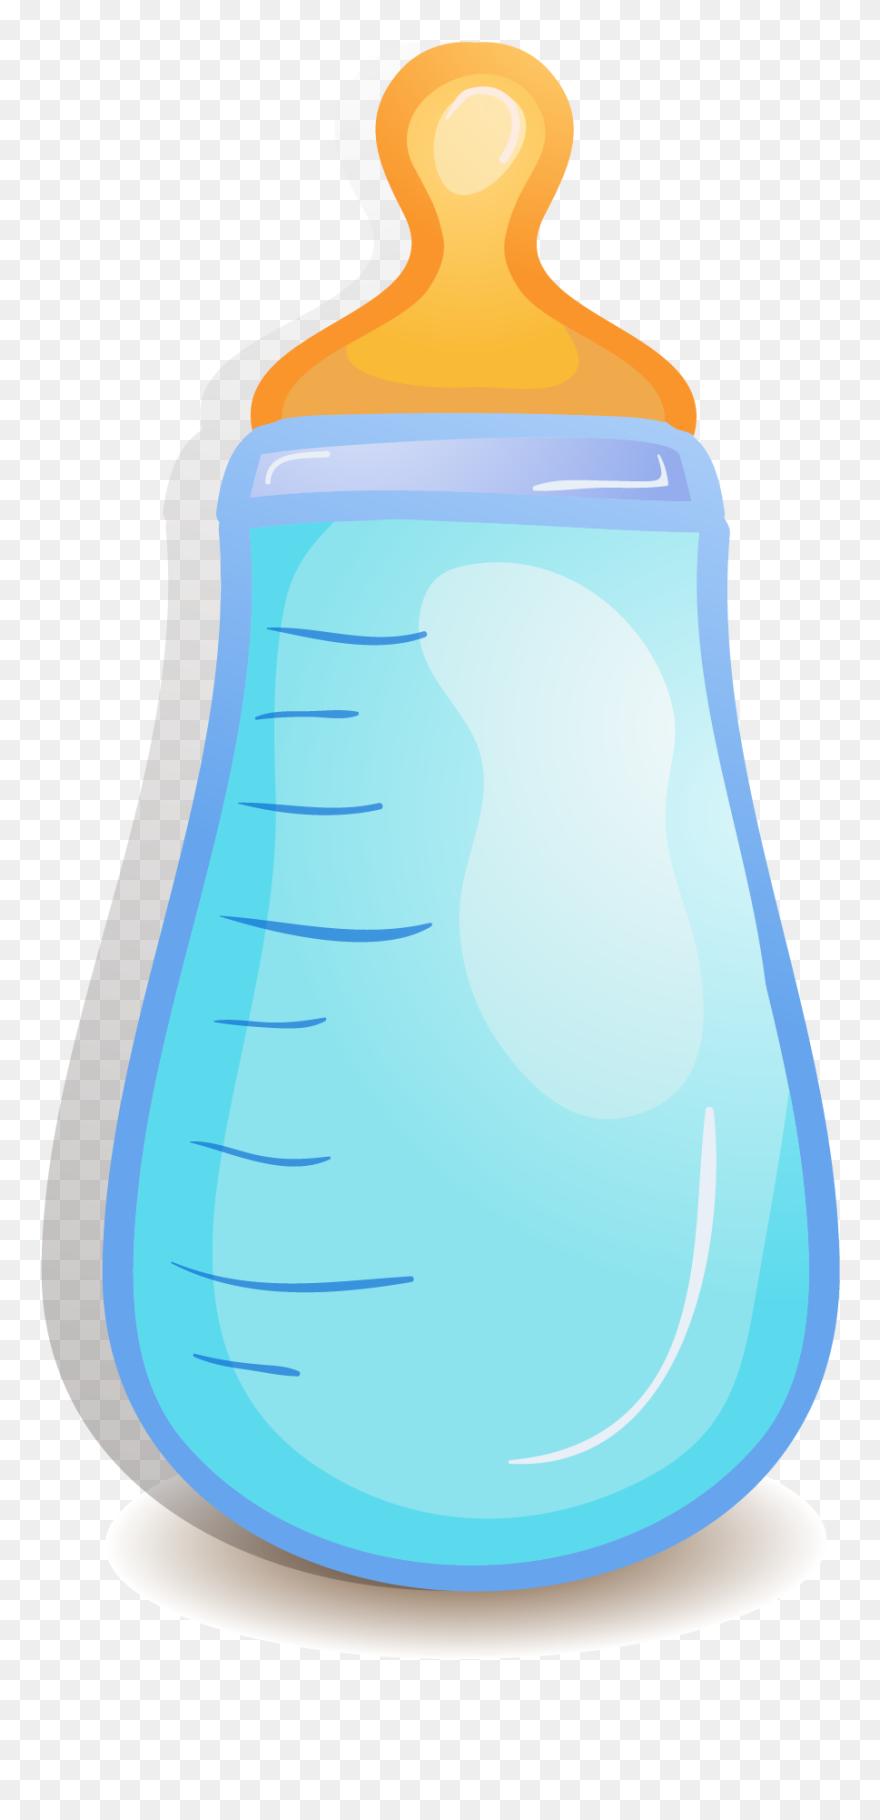 Baby Bottle Infant Blue Baby Cartoon Bottles Clipart 5642572 Pinclipart